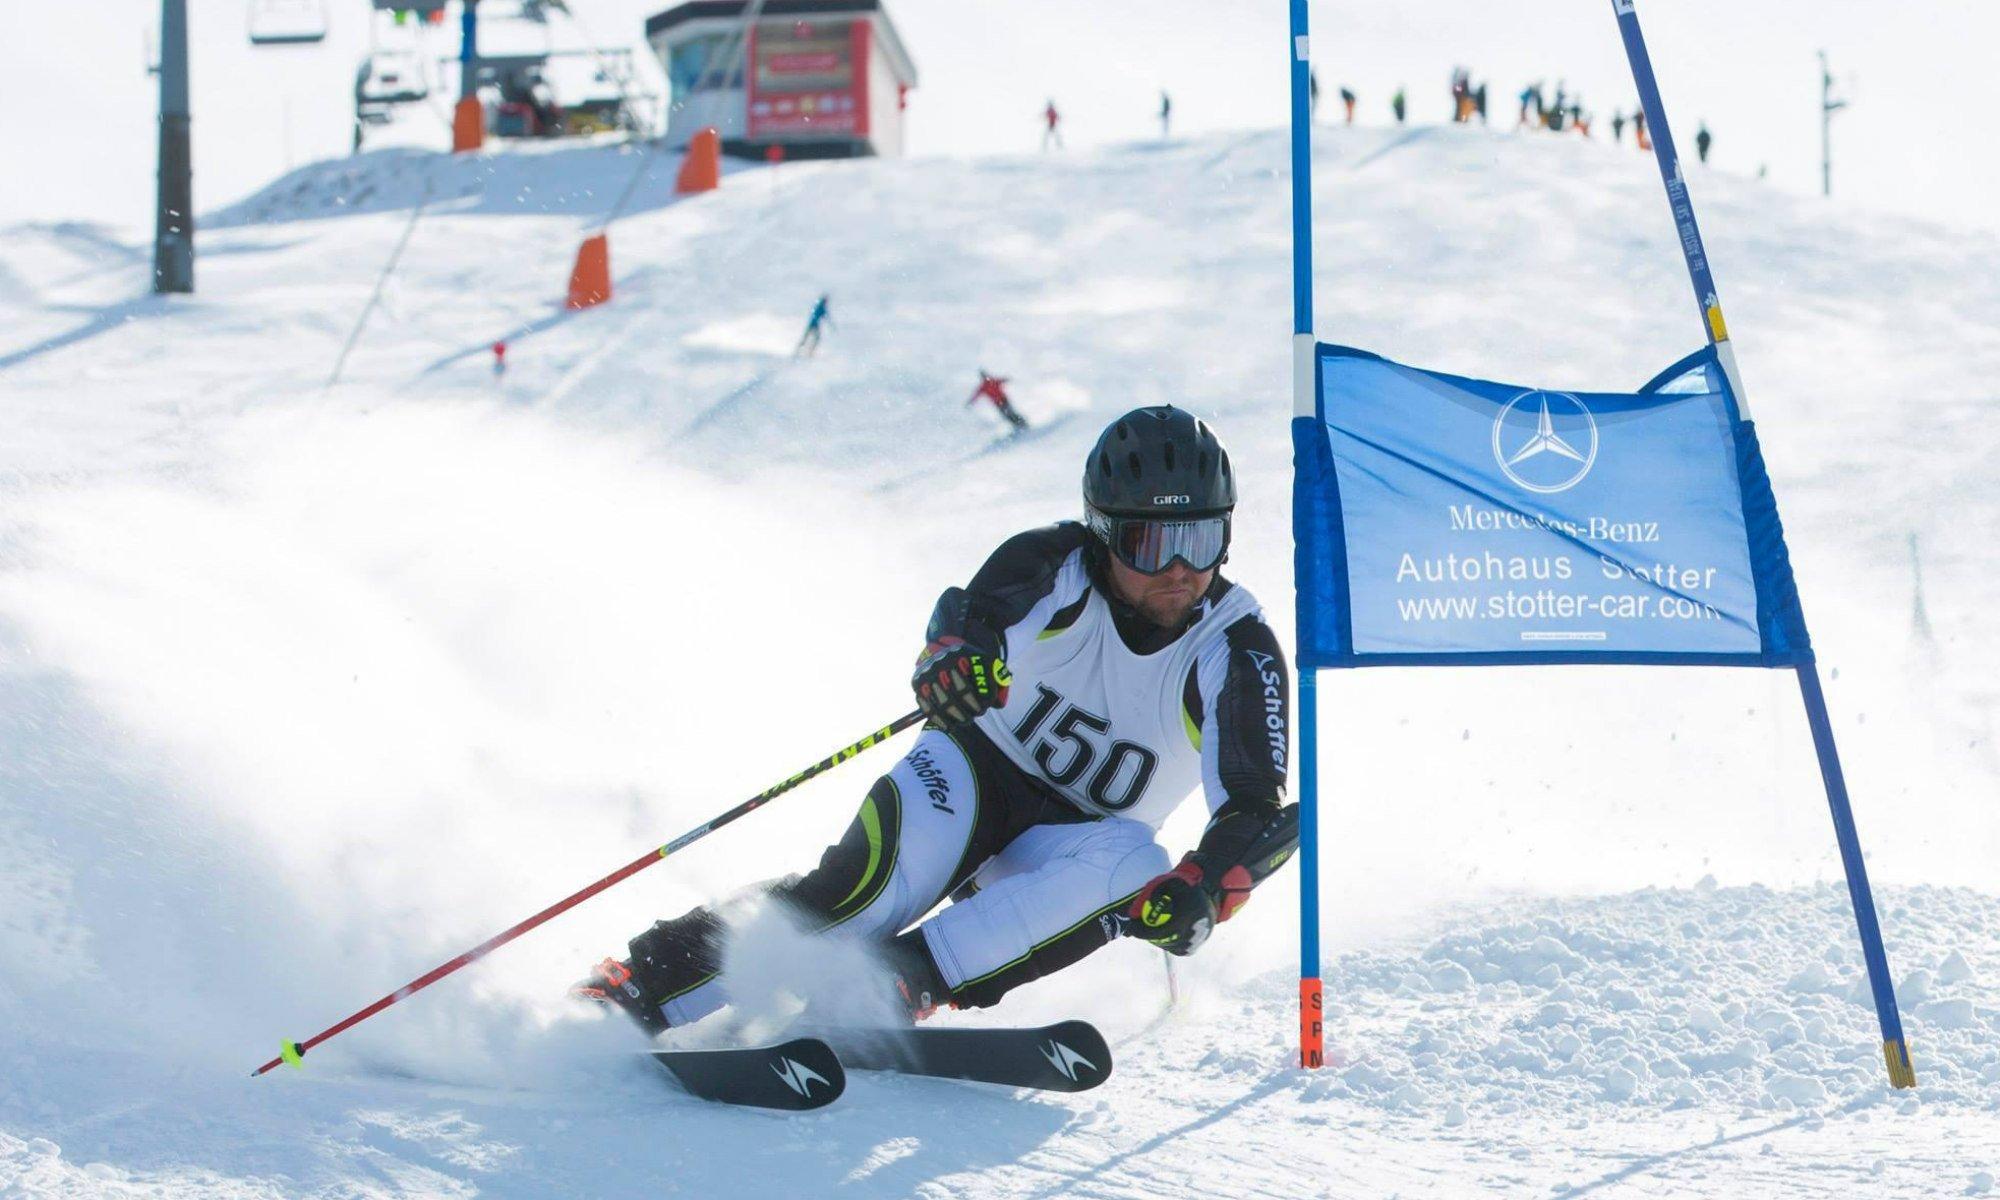 A skier sliding down a race slope.